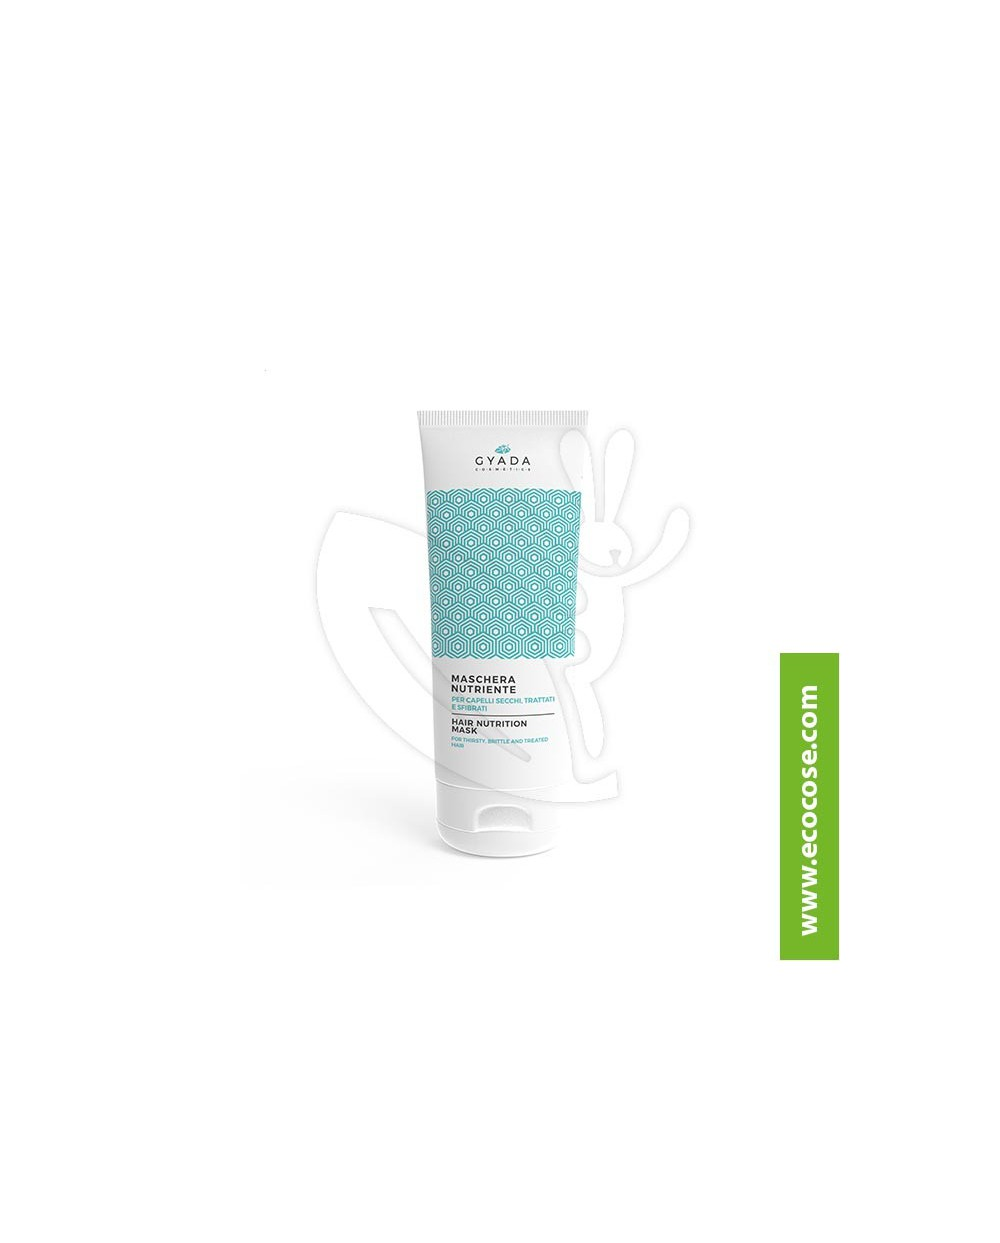 Gyada Cosmetics - Maschera nutriente